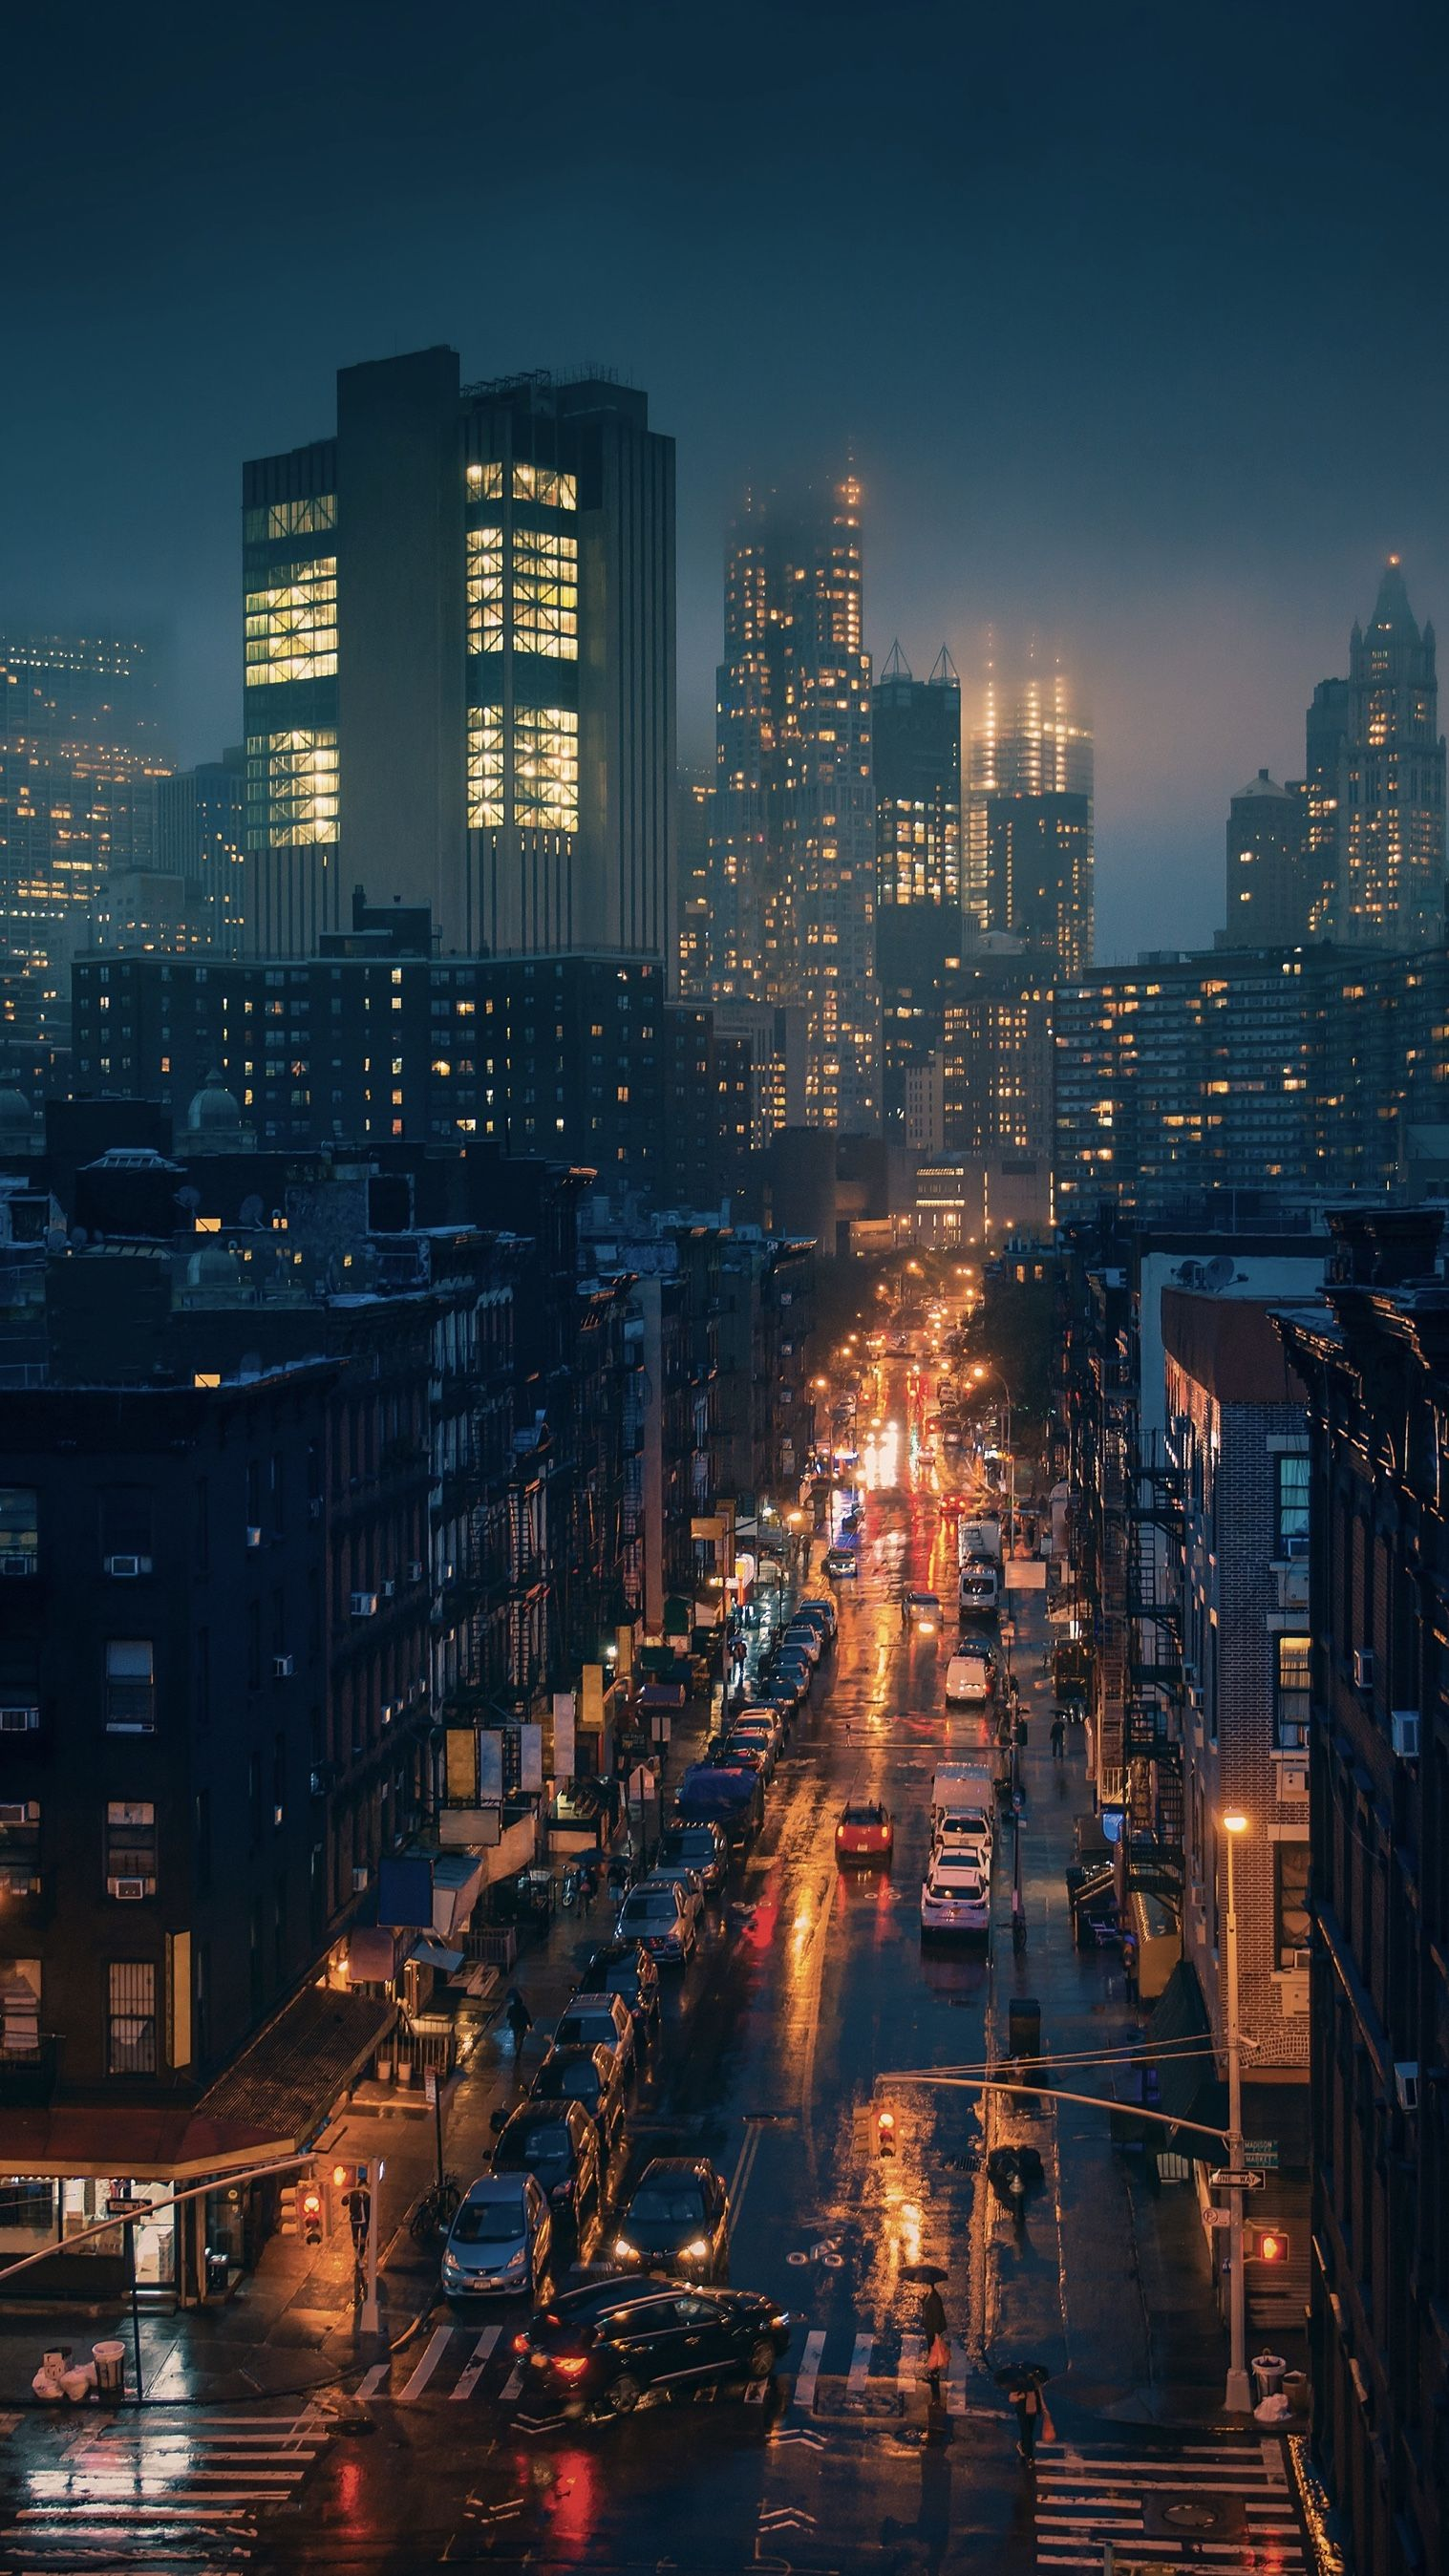 Night City Wallpaper City Wallpaper City Iphone Wallpaper Night City